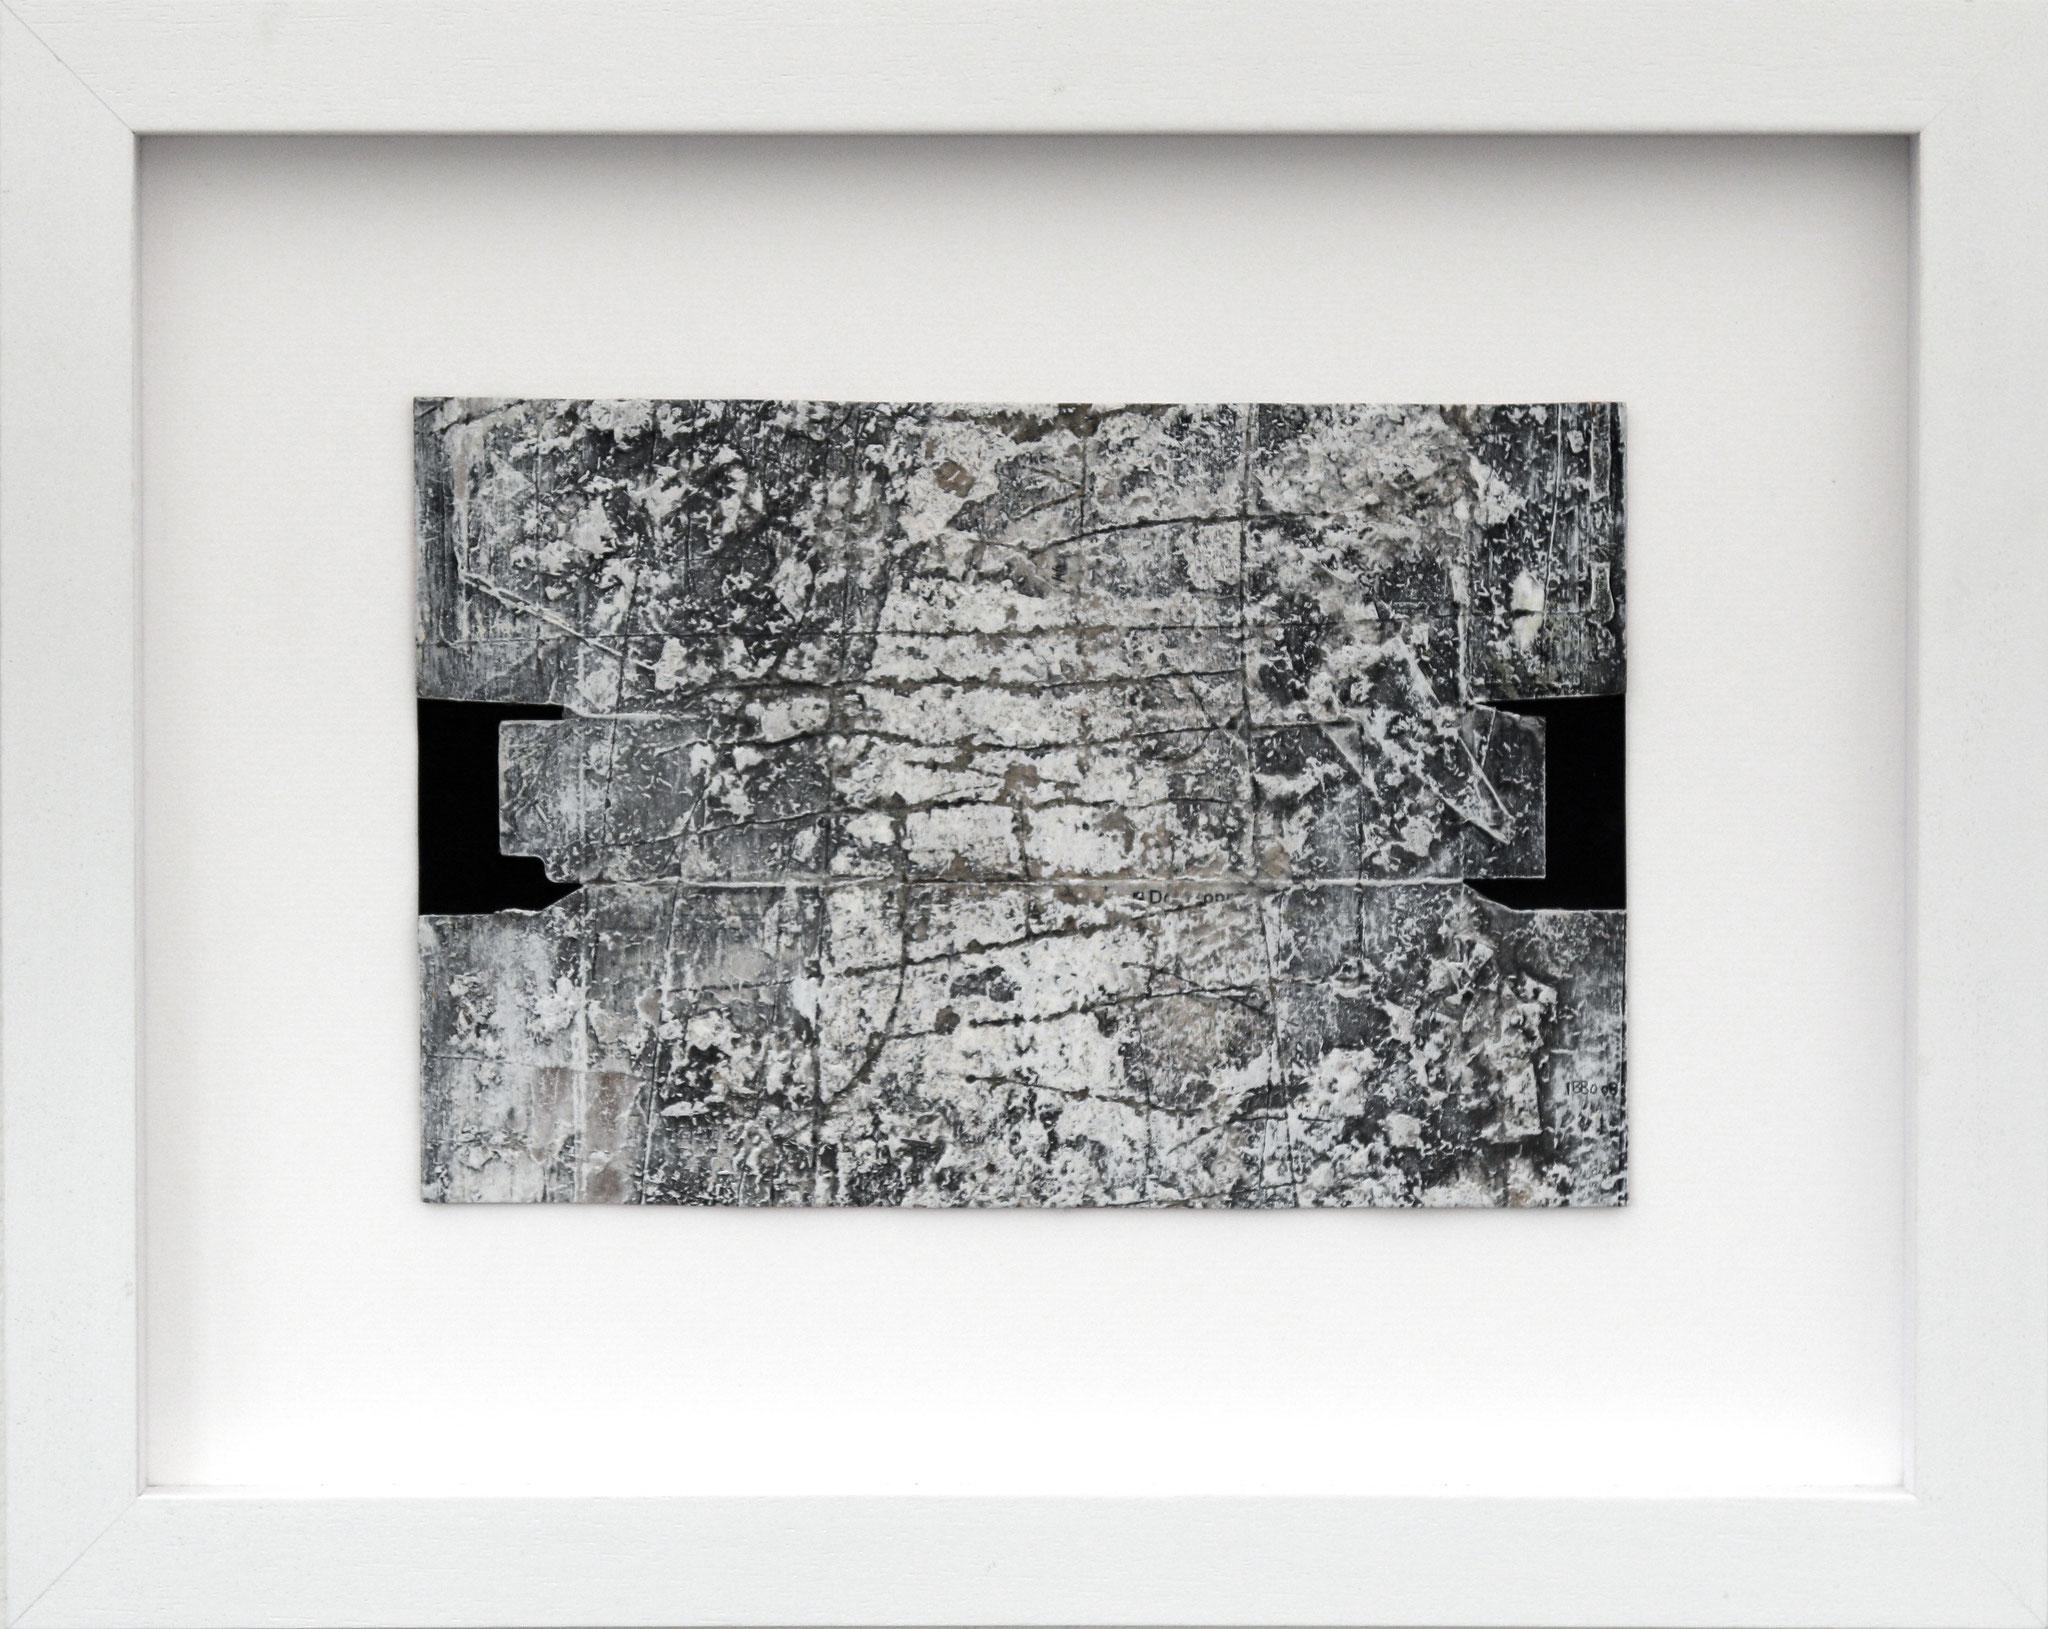 Enter-Exist-Exit 32 x 22 cm Mixed media (53 x 43 cm framed)